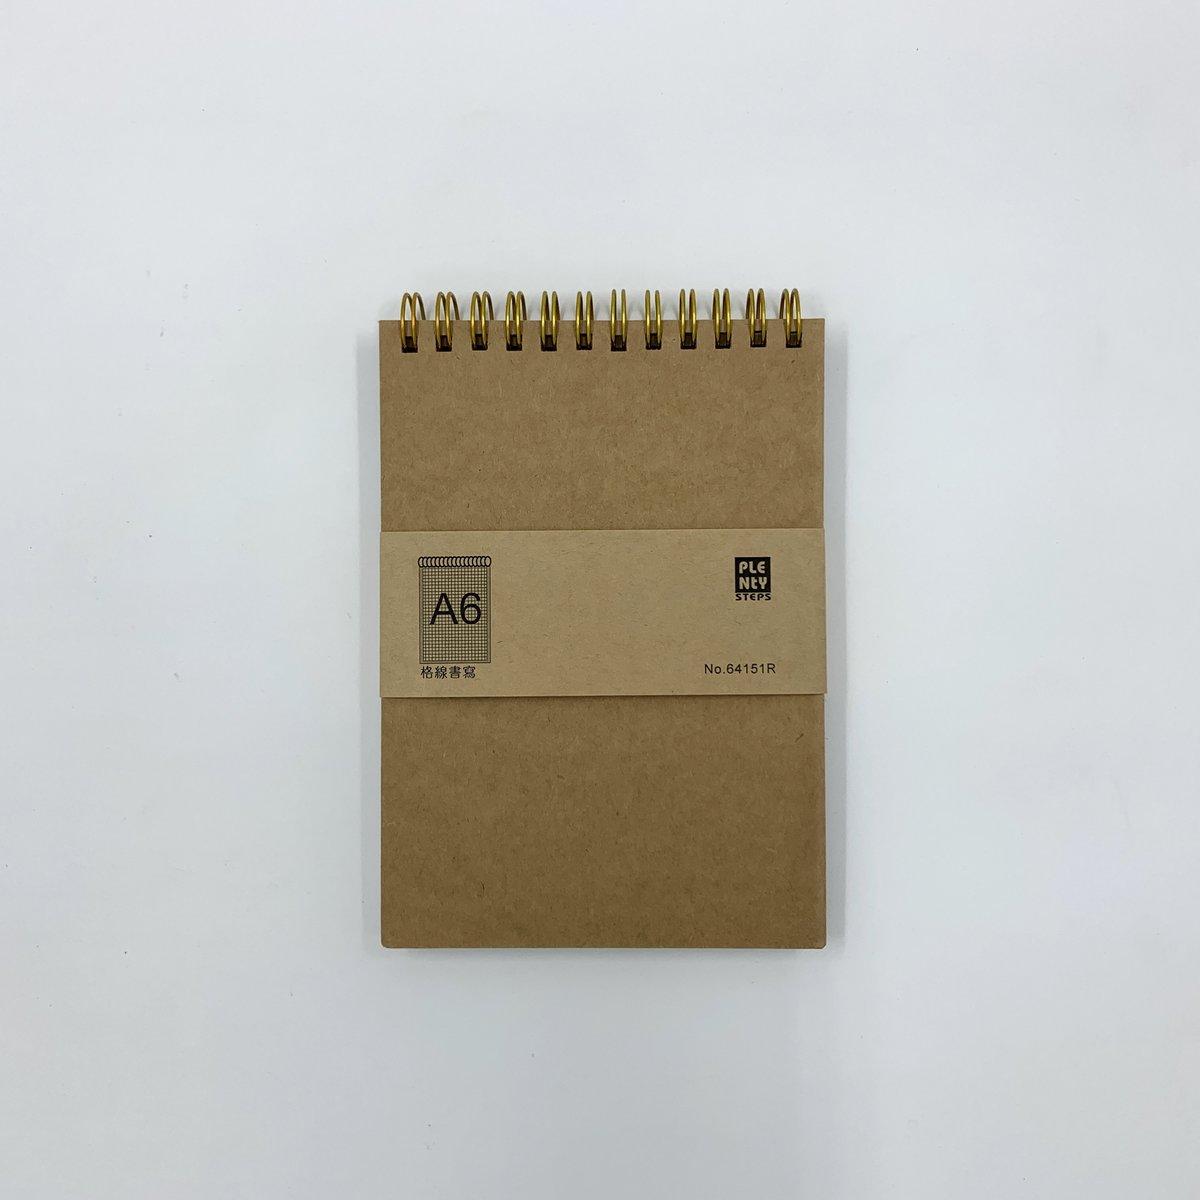 #64151R A6 Ultra-THICK Wire-O Checks Notebook - 3 books